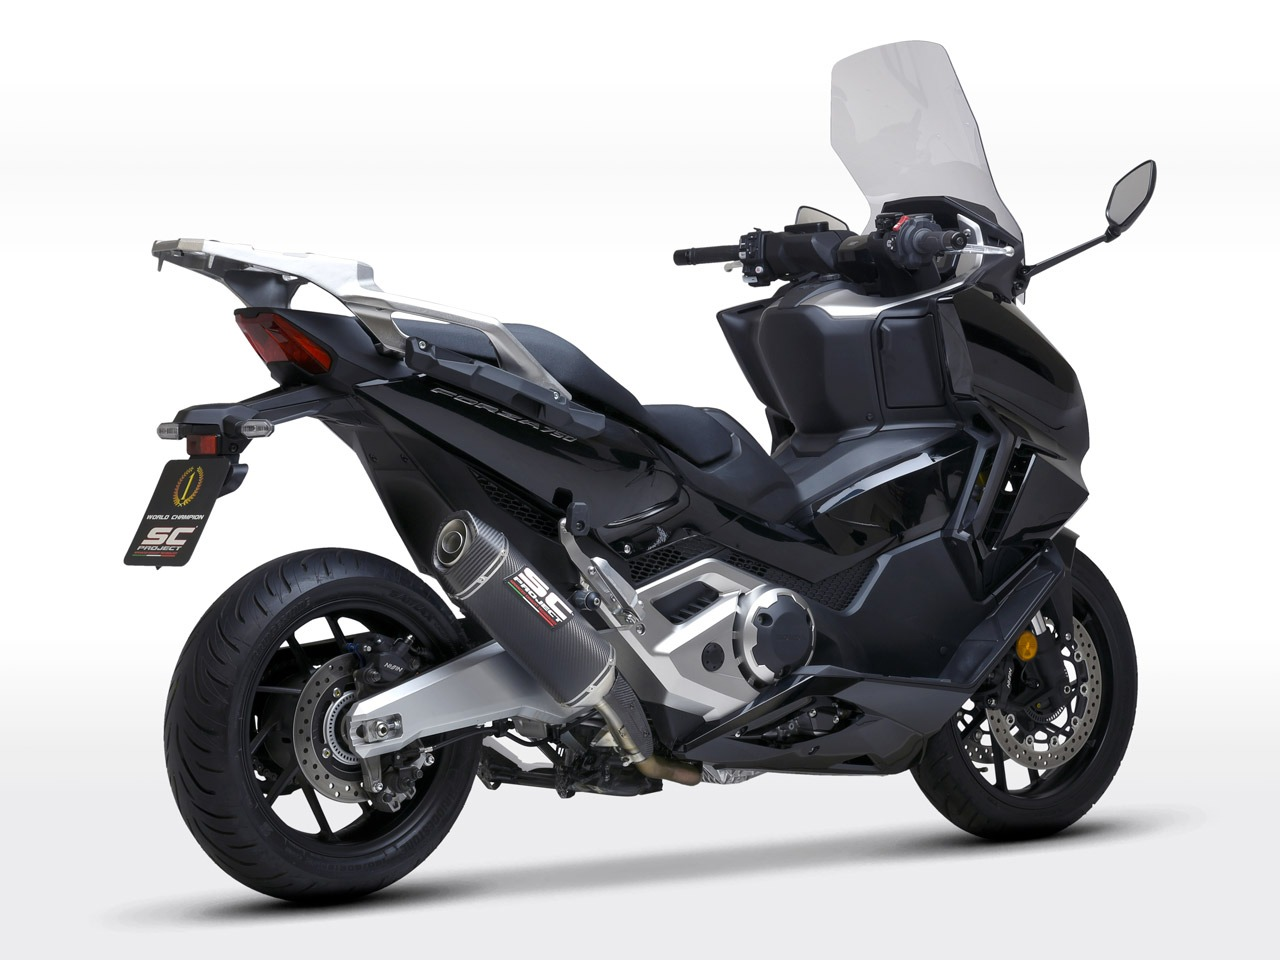 Honda_Forza750_my2021_SC1S-Carbonio_3-4Posteriore_1280x960px_web-partnership